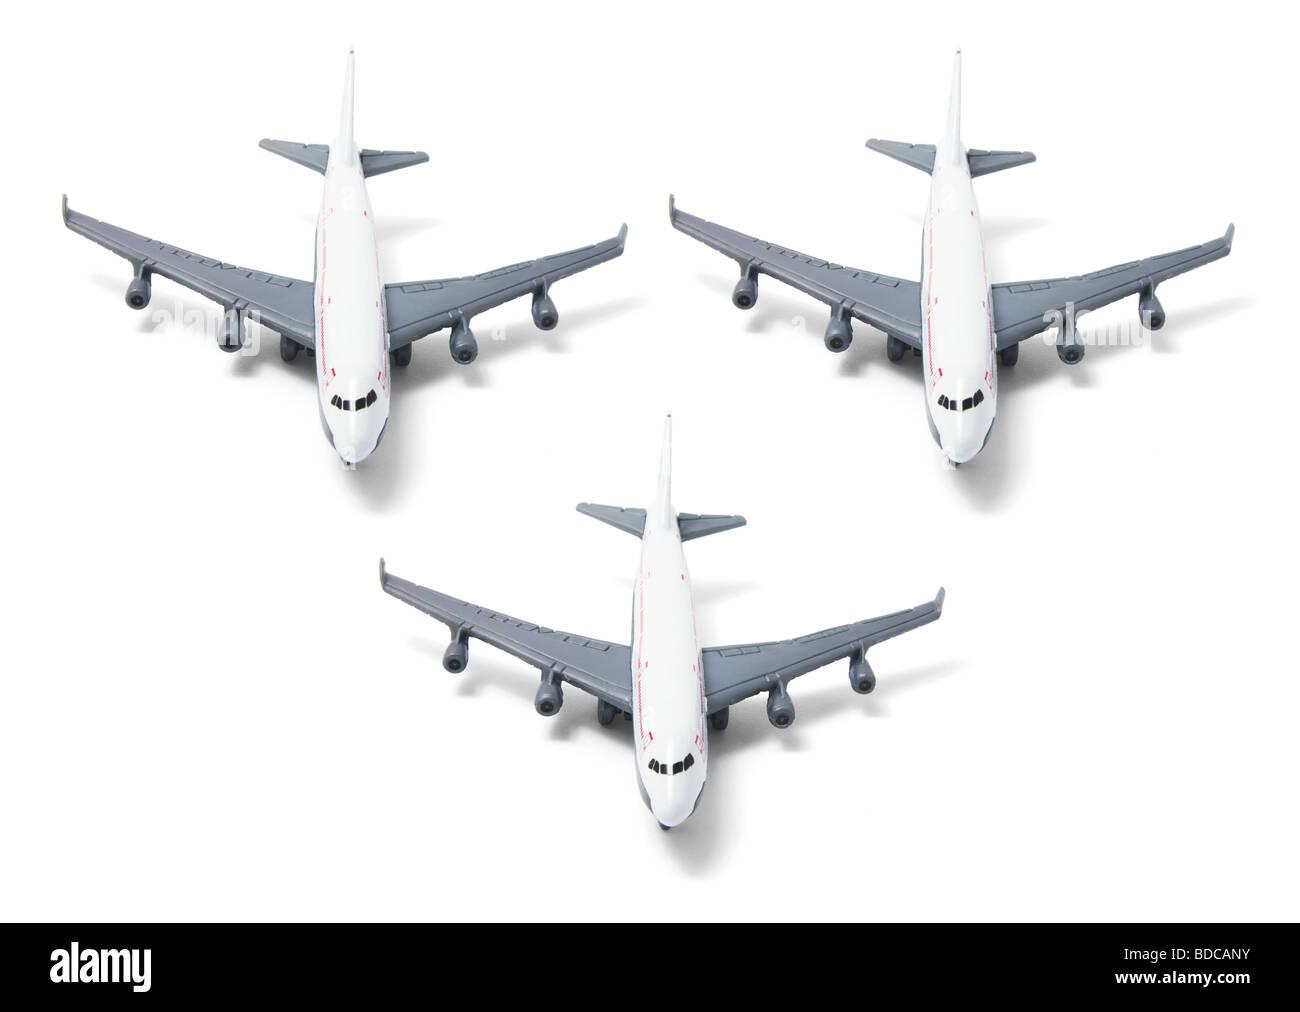 Plane Models - Stock Image